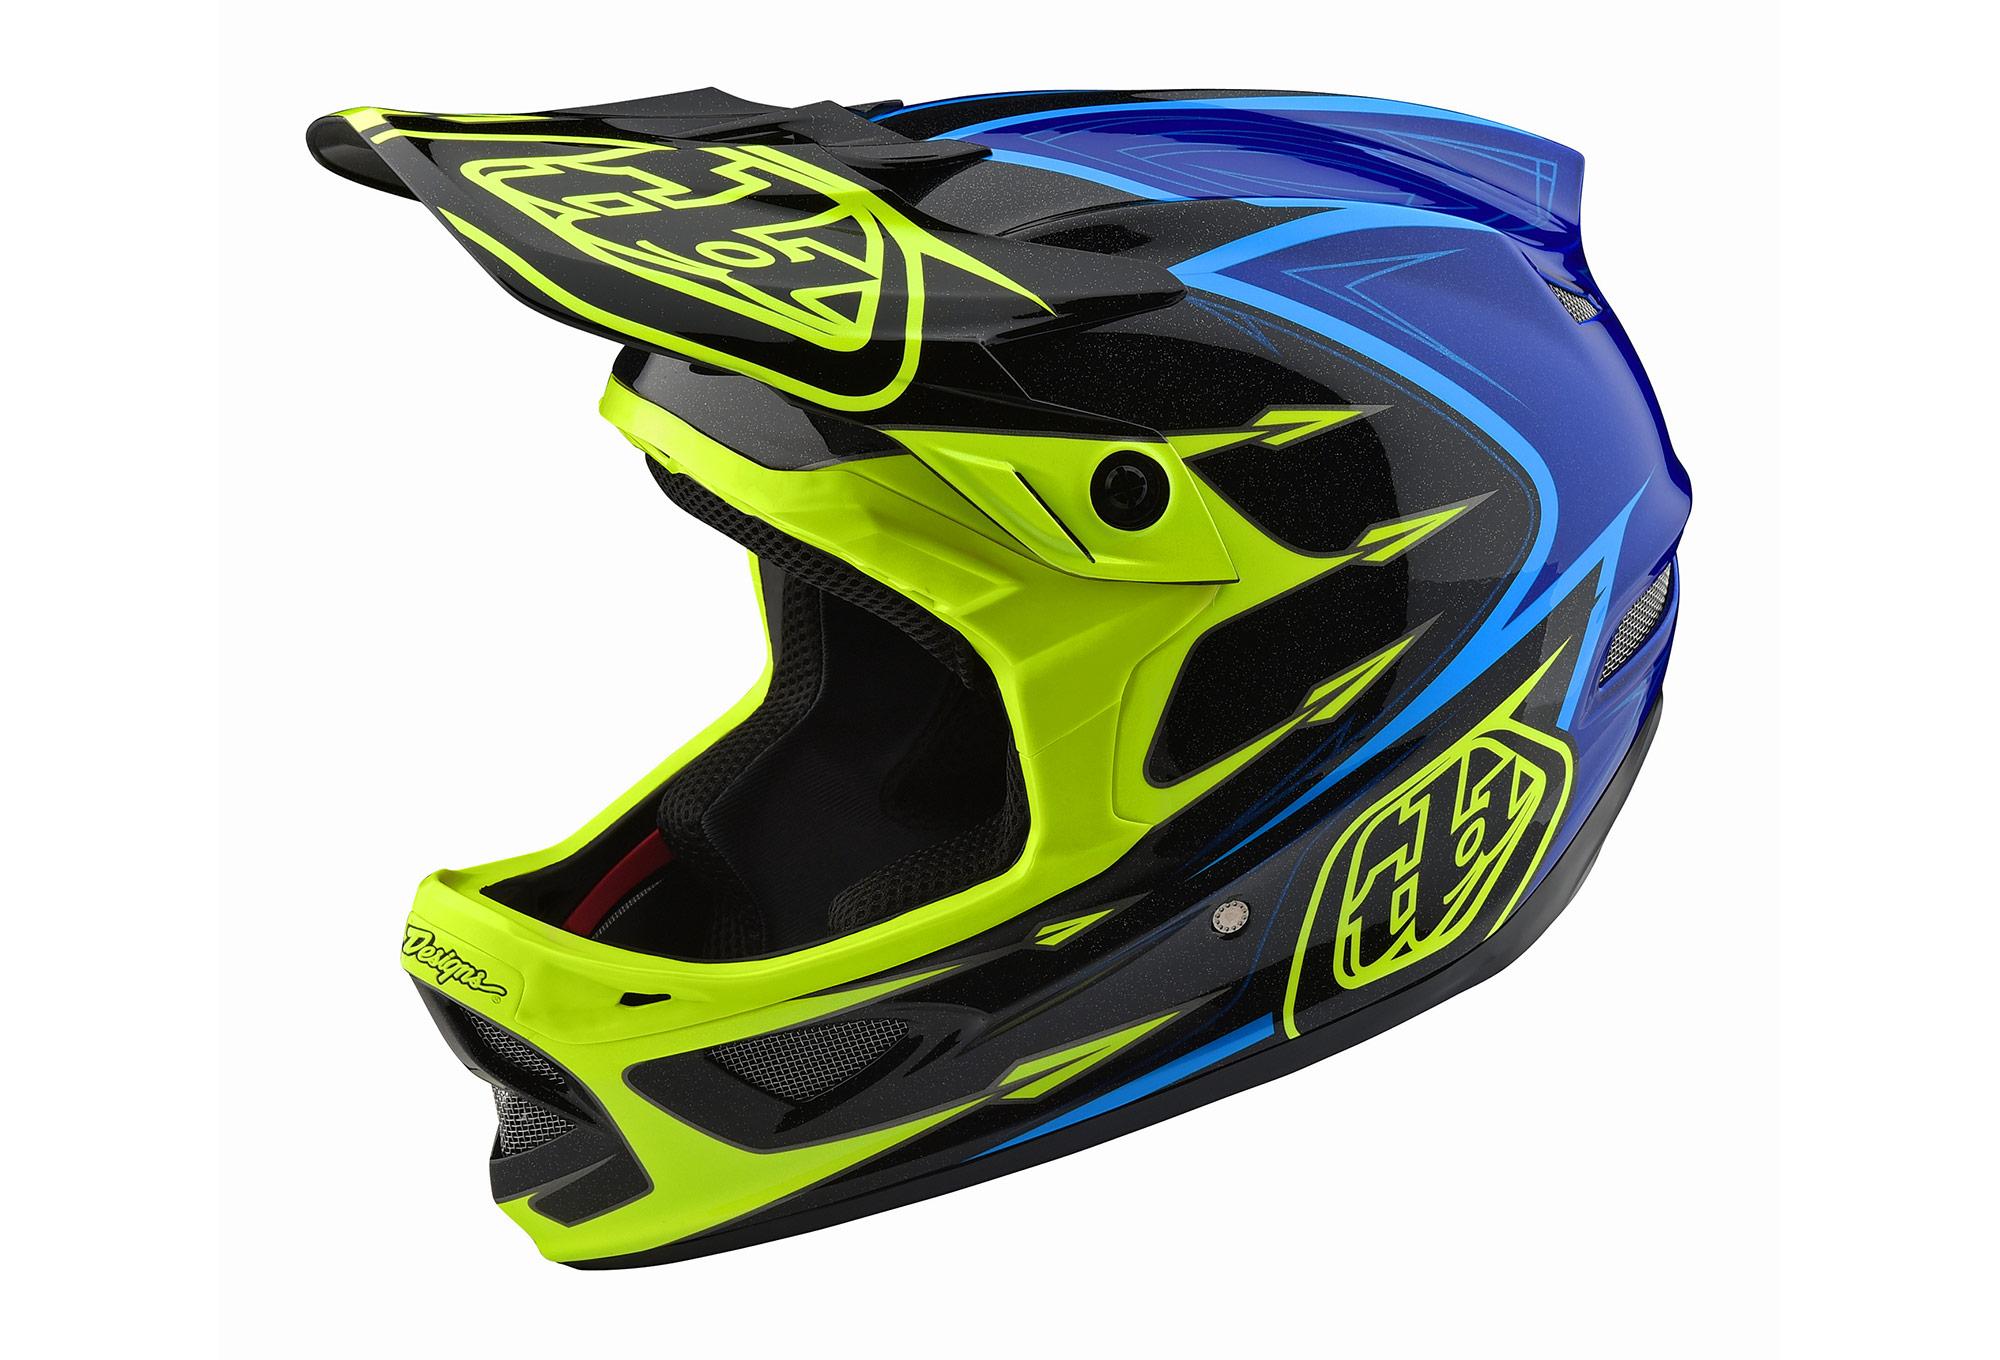 Troy Lee Designs D3 Composite Corona Helm Neon Gelb Blau